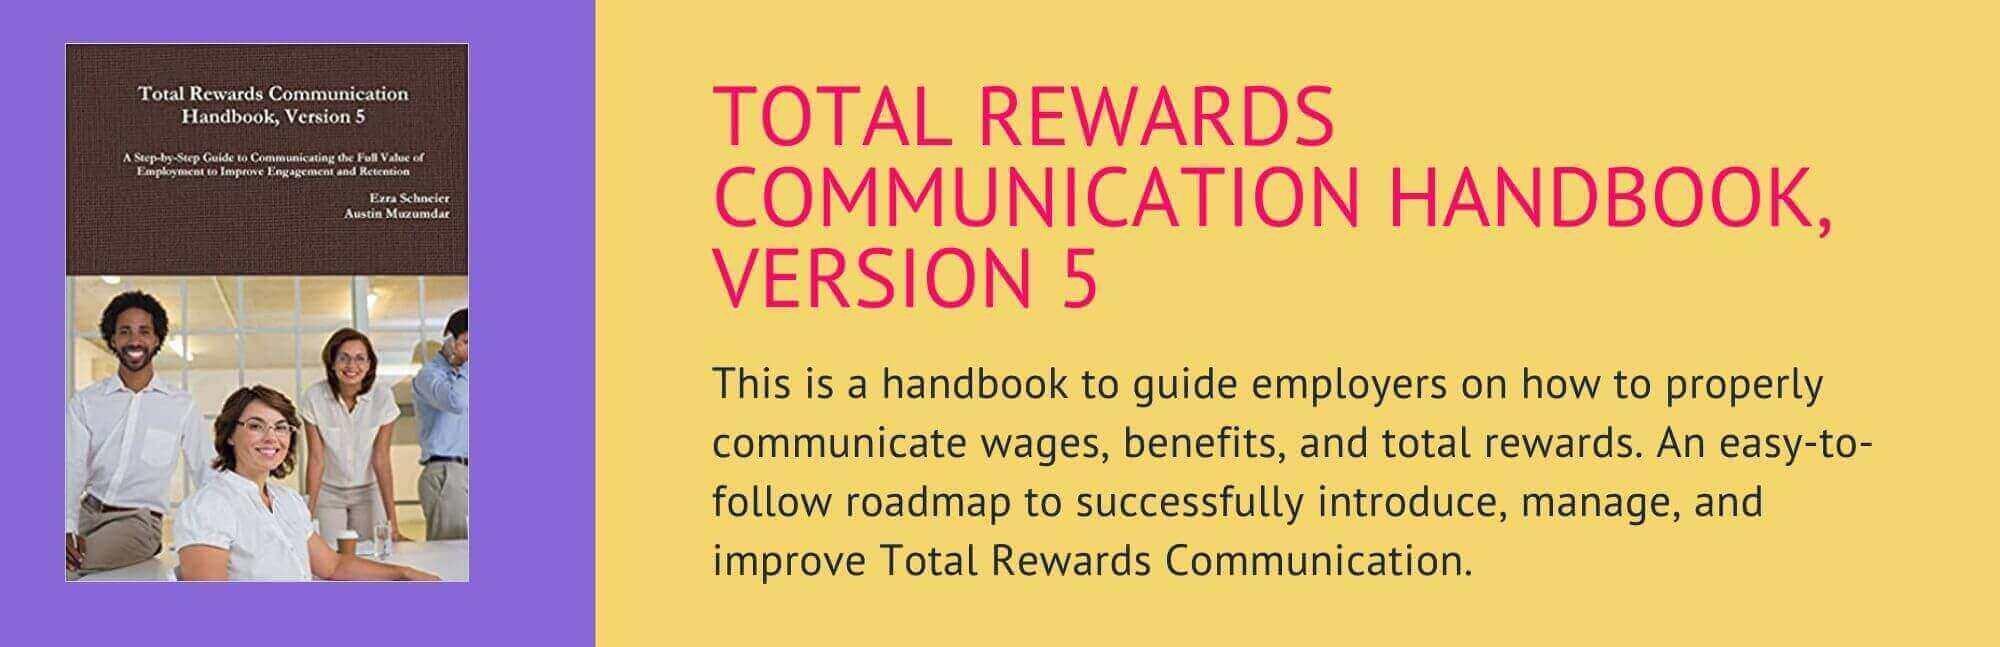 Total-rewards-communication-handbook